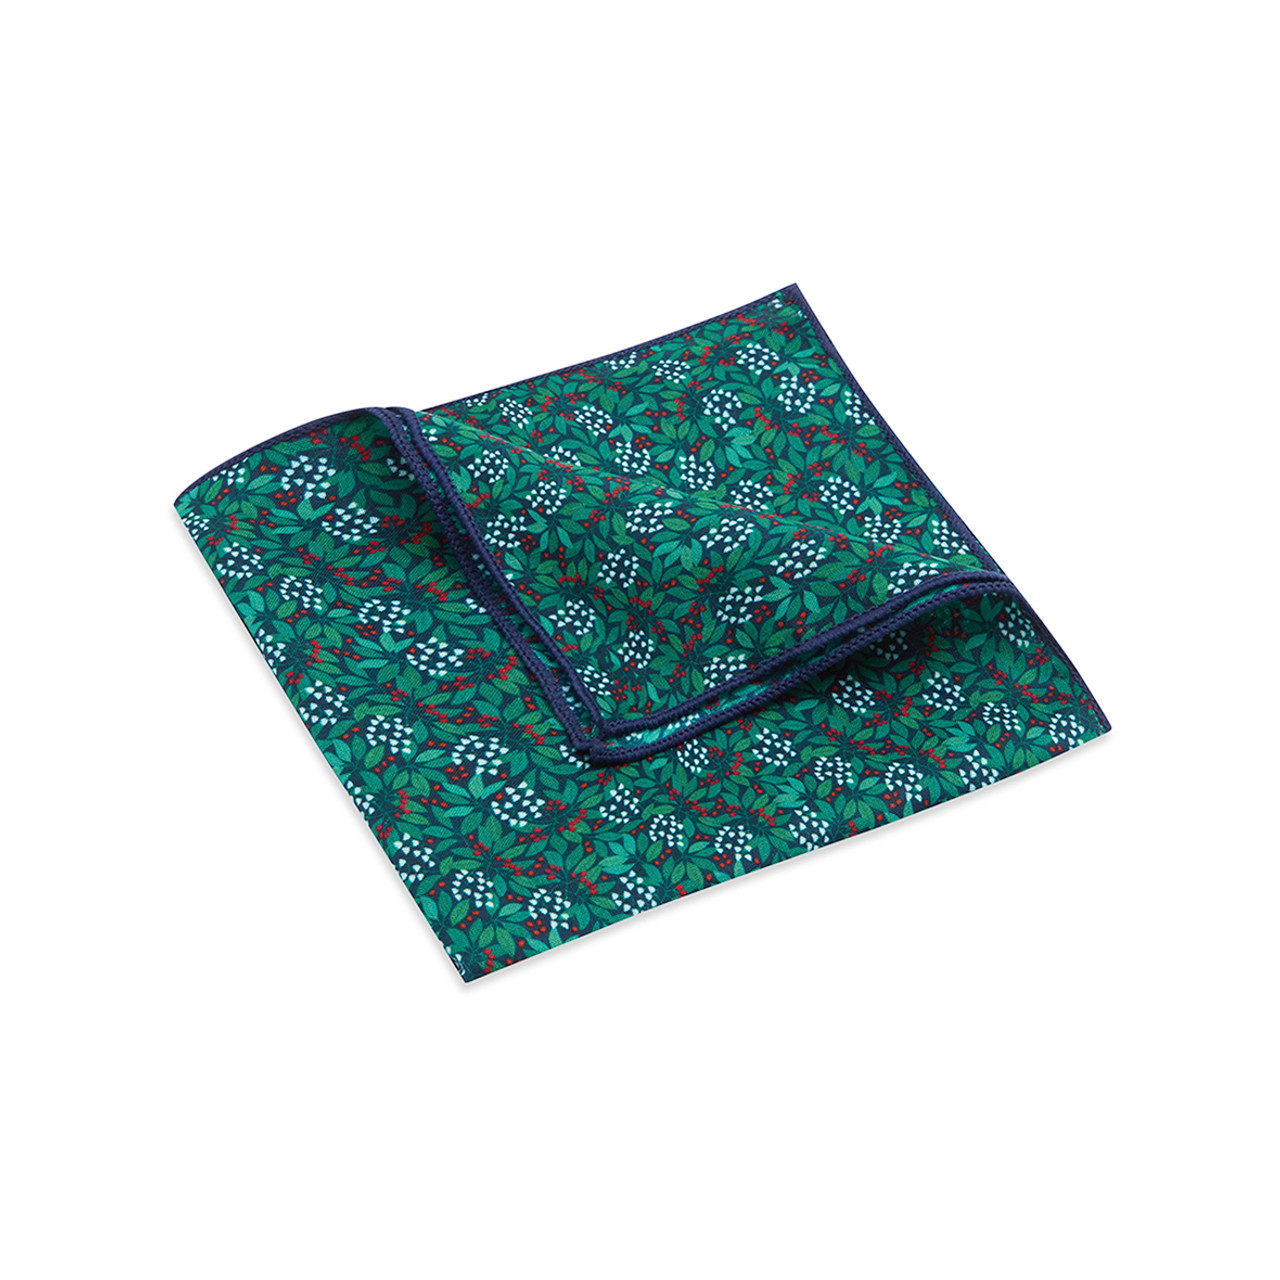 Pocket Square, Jocelyn Proust 4, Navy/Red.